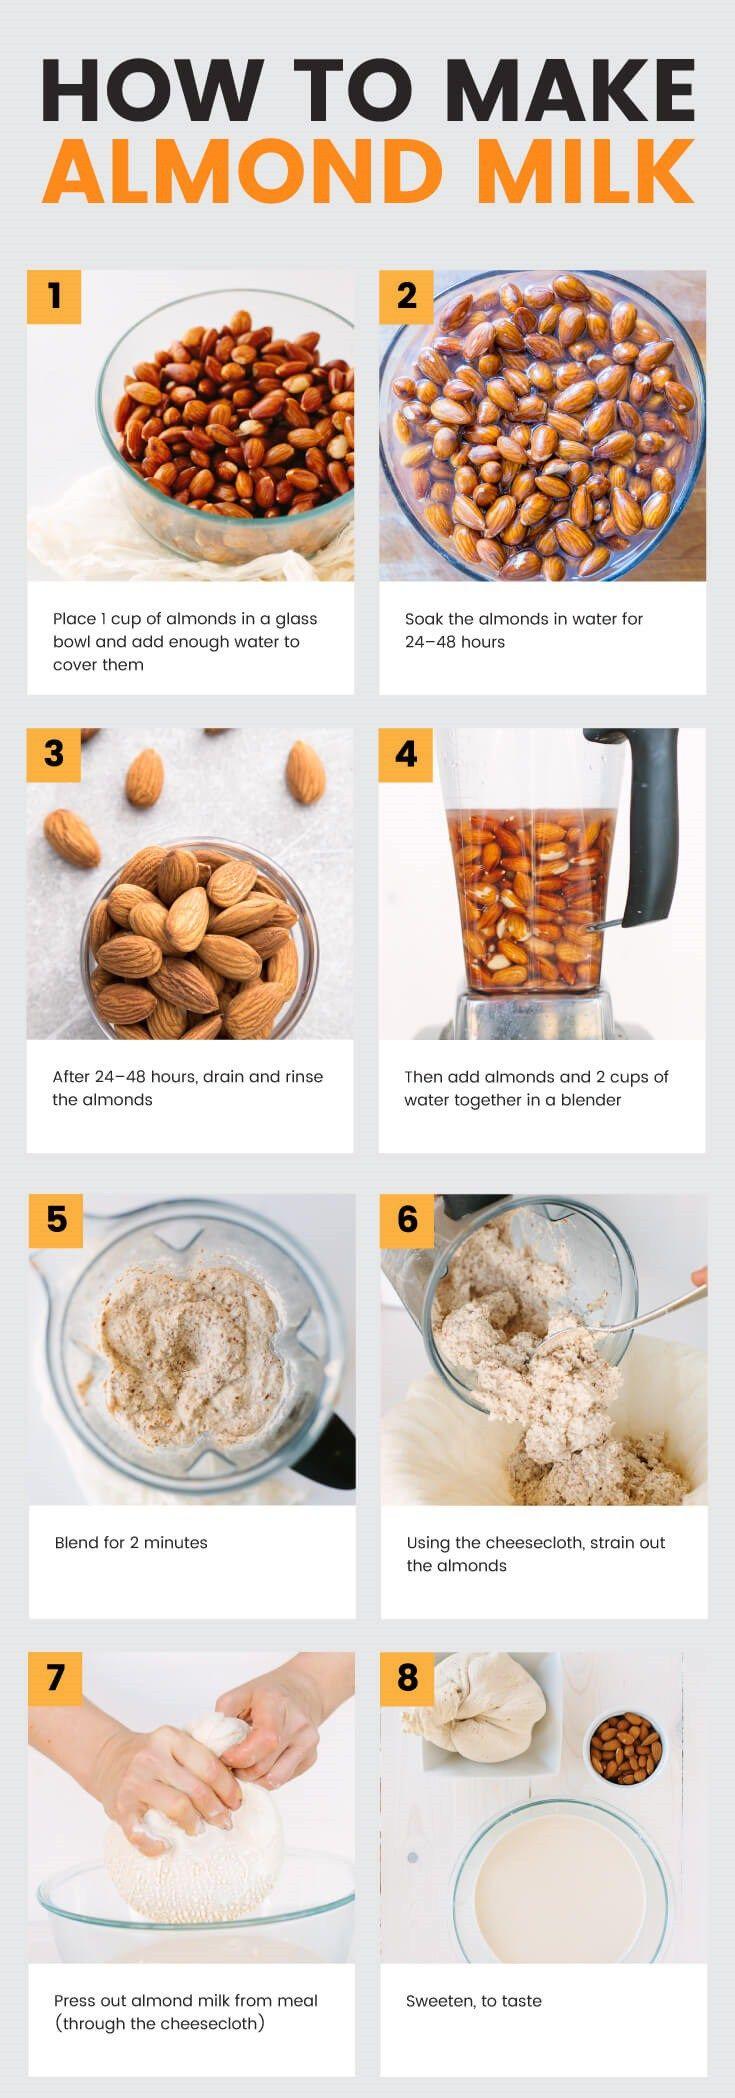 Almond Milk Nutrition Benefits for the Brain, Heart